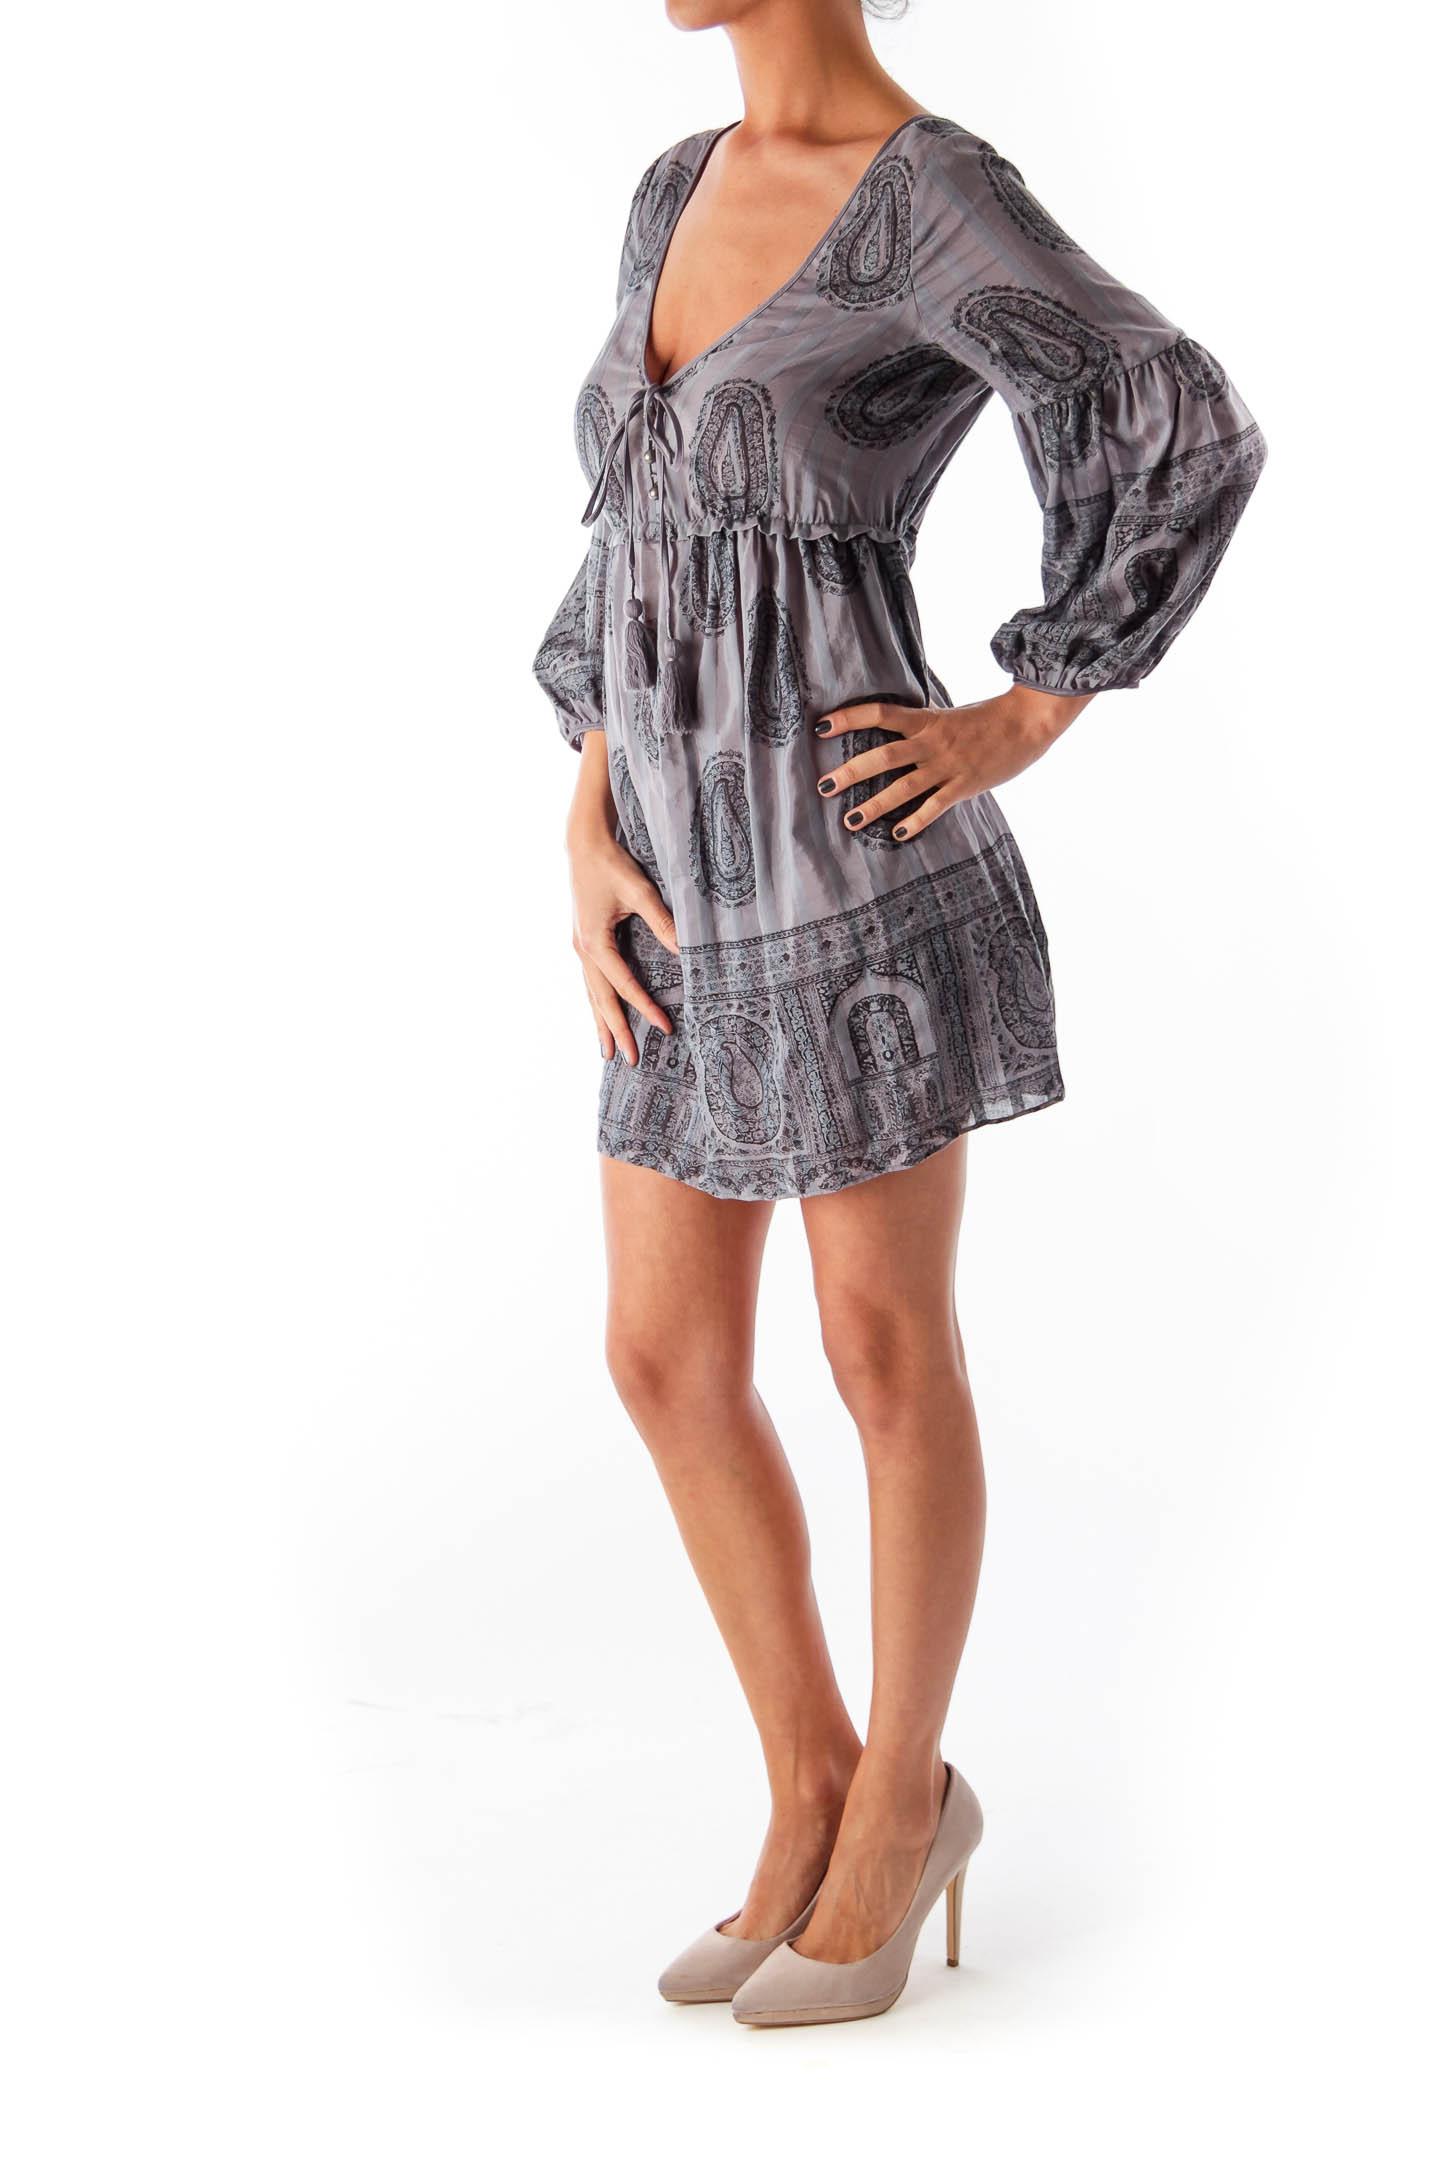 Gray Paisley Print Dress